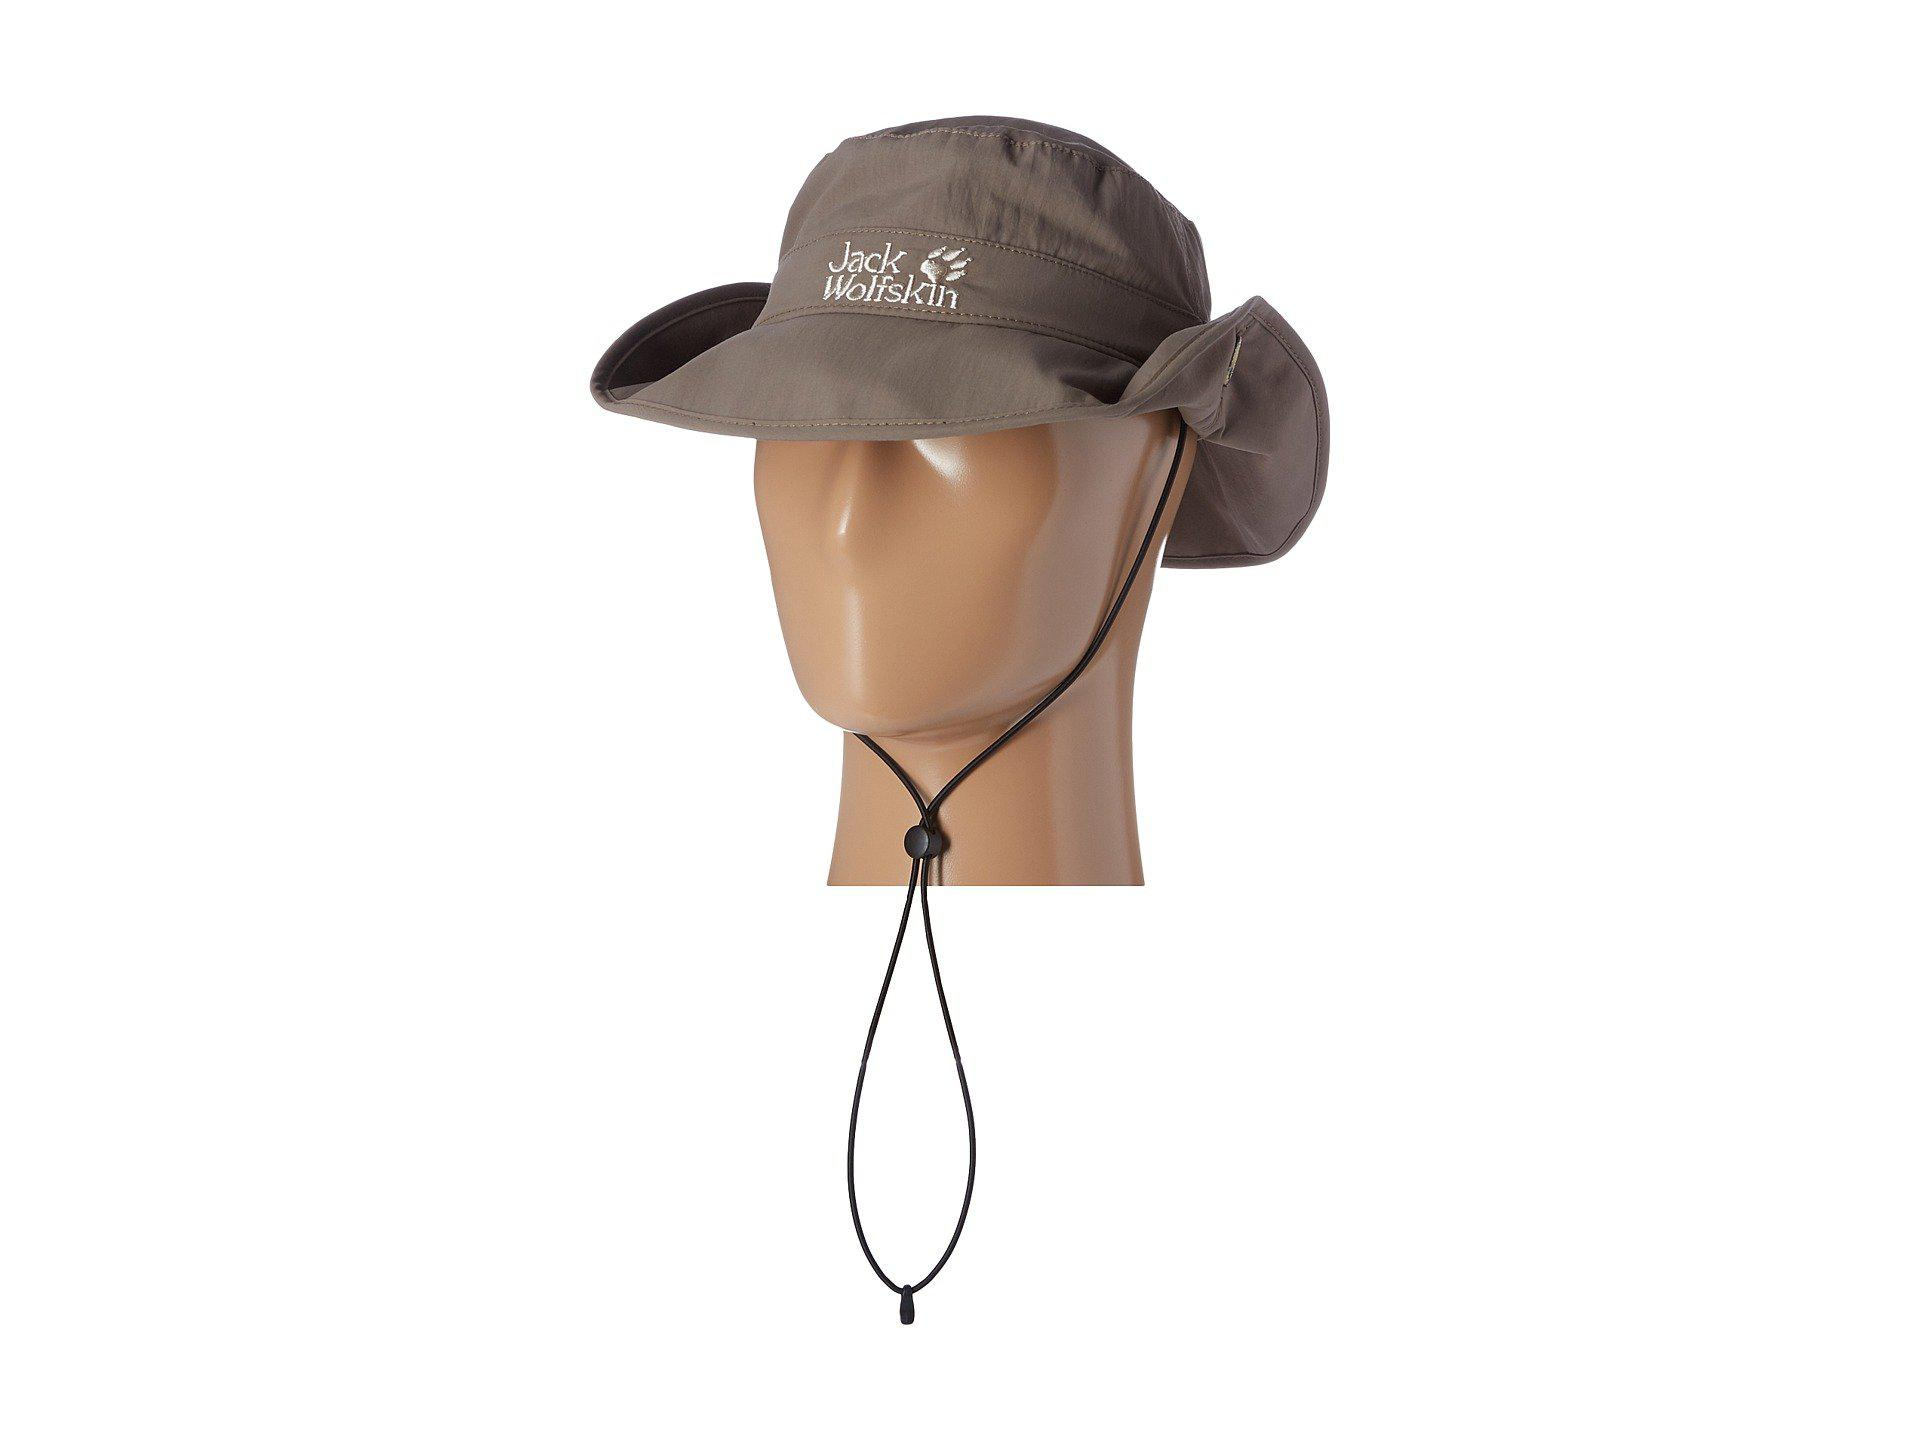 b4dbe1af Jack Wolfskin Supplex Mesh Hat (siltstone) Caps in Natural for Men ...